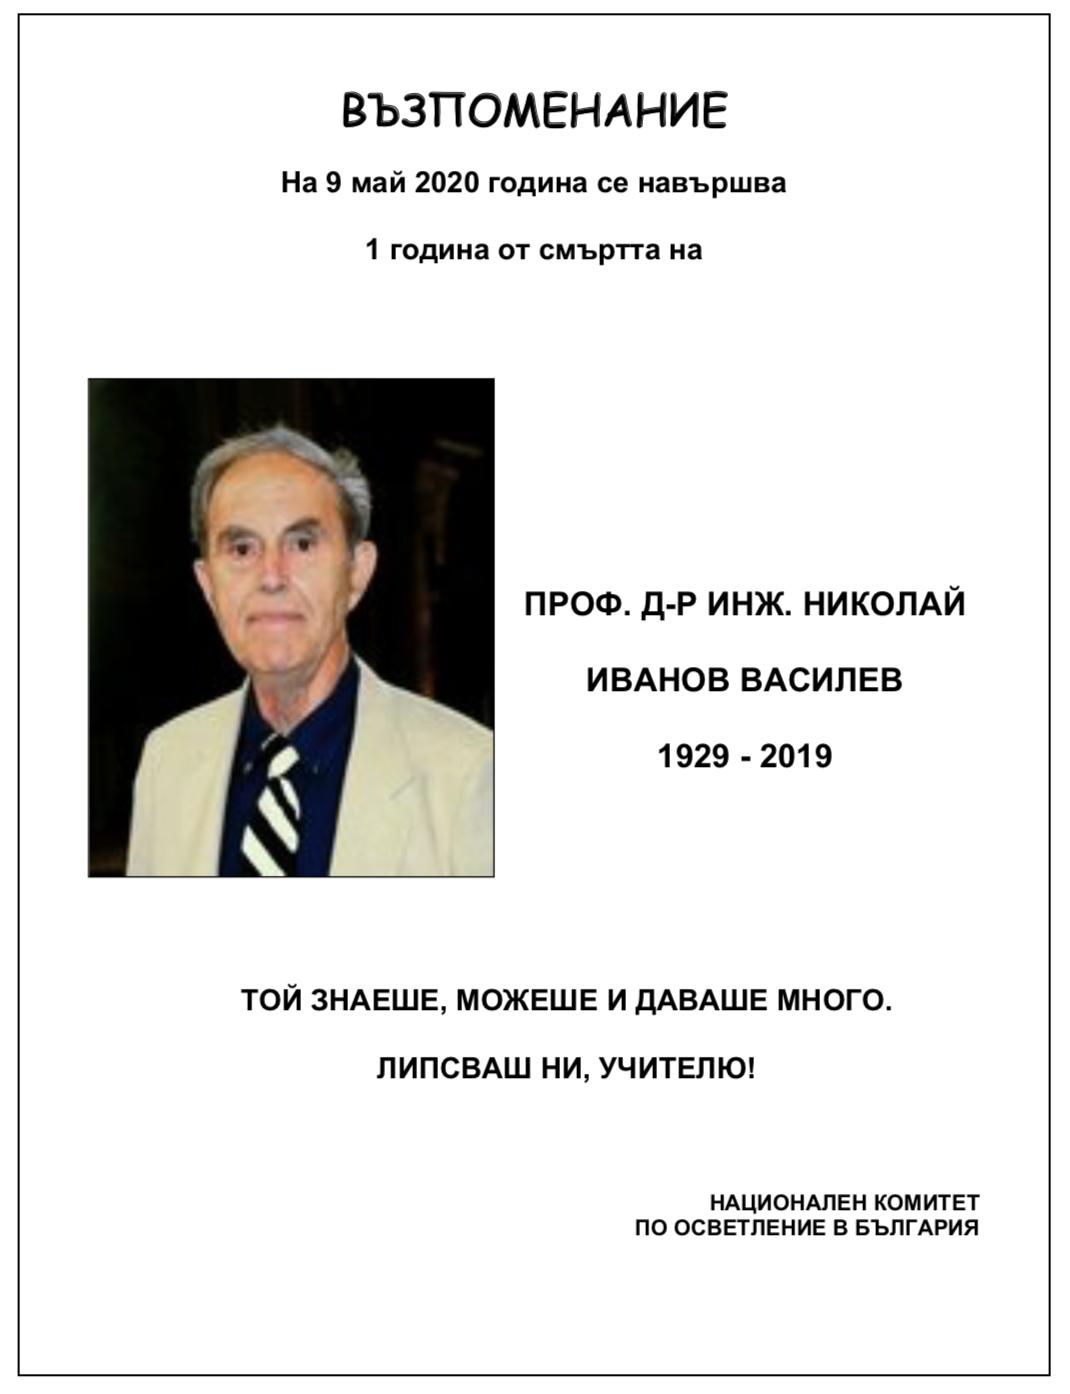 Nikolay-Vassilev